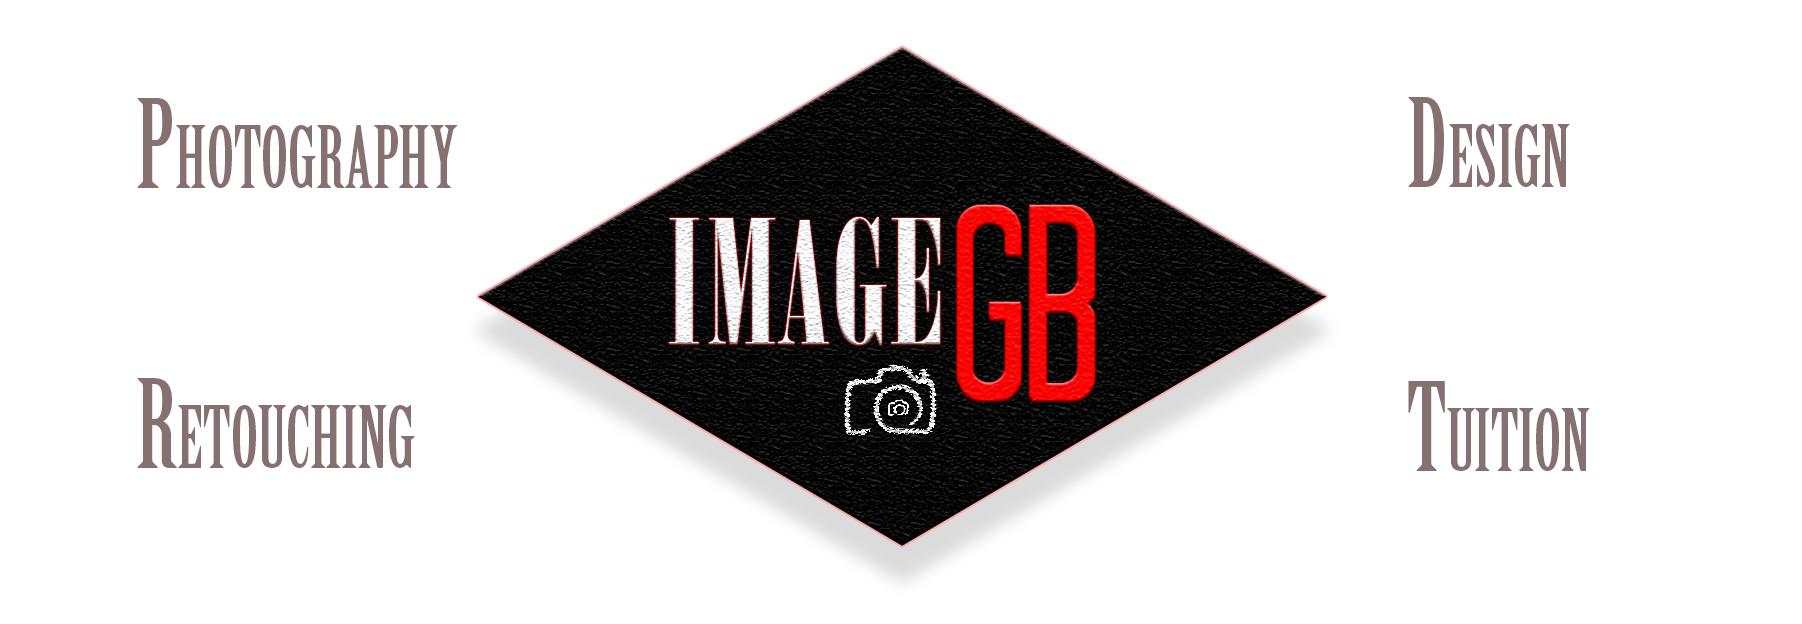 Image GB